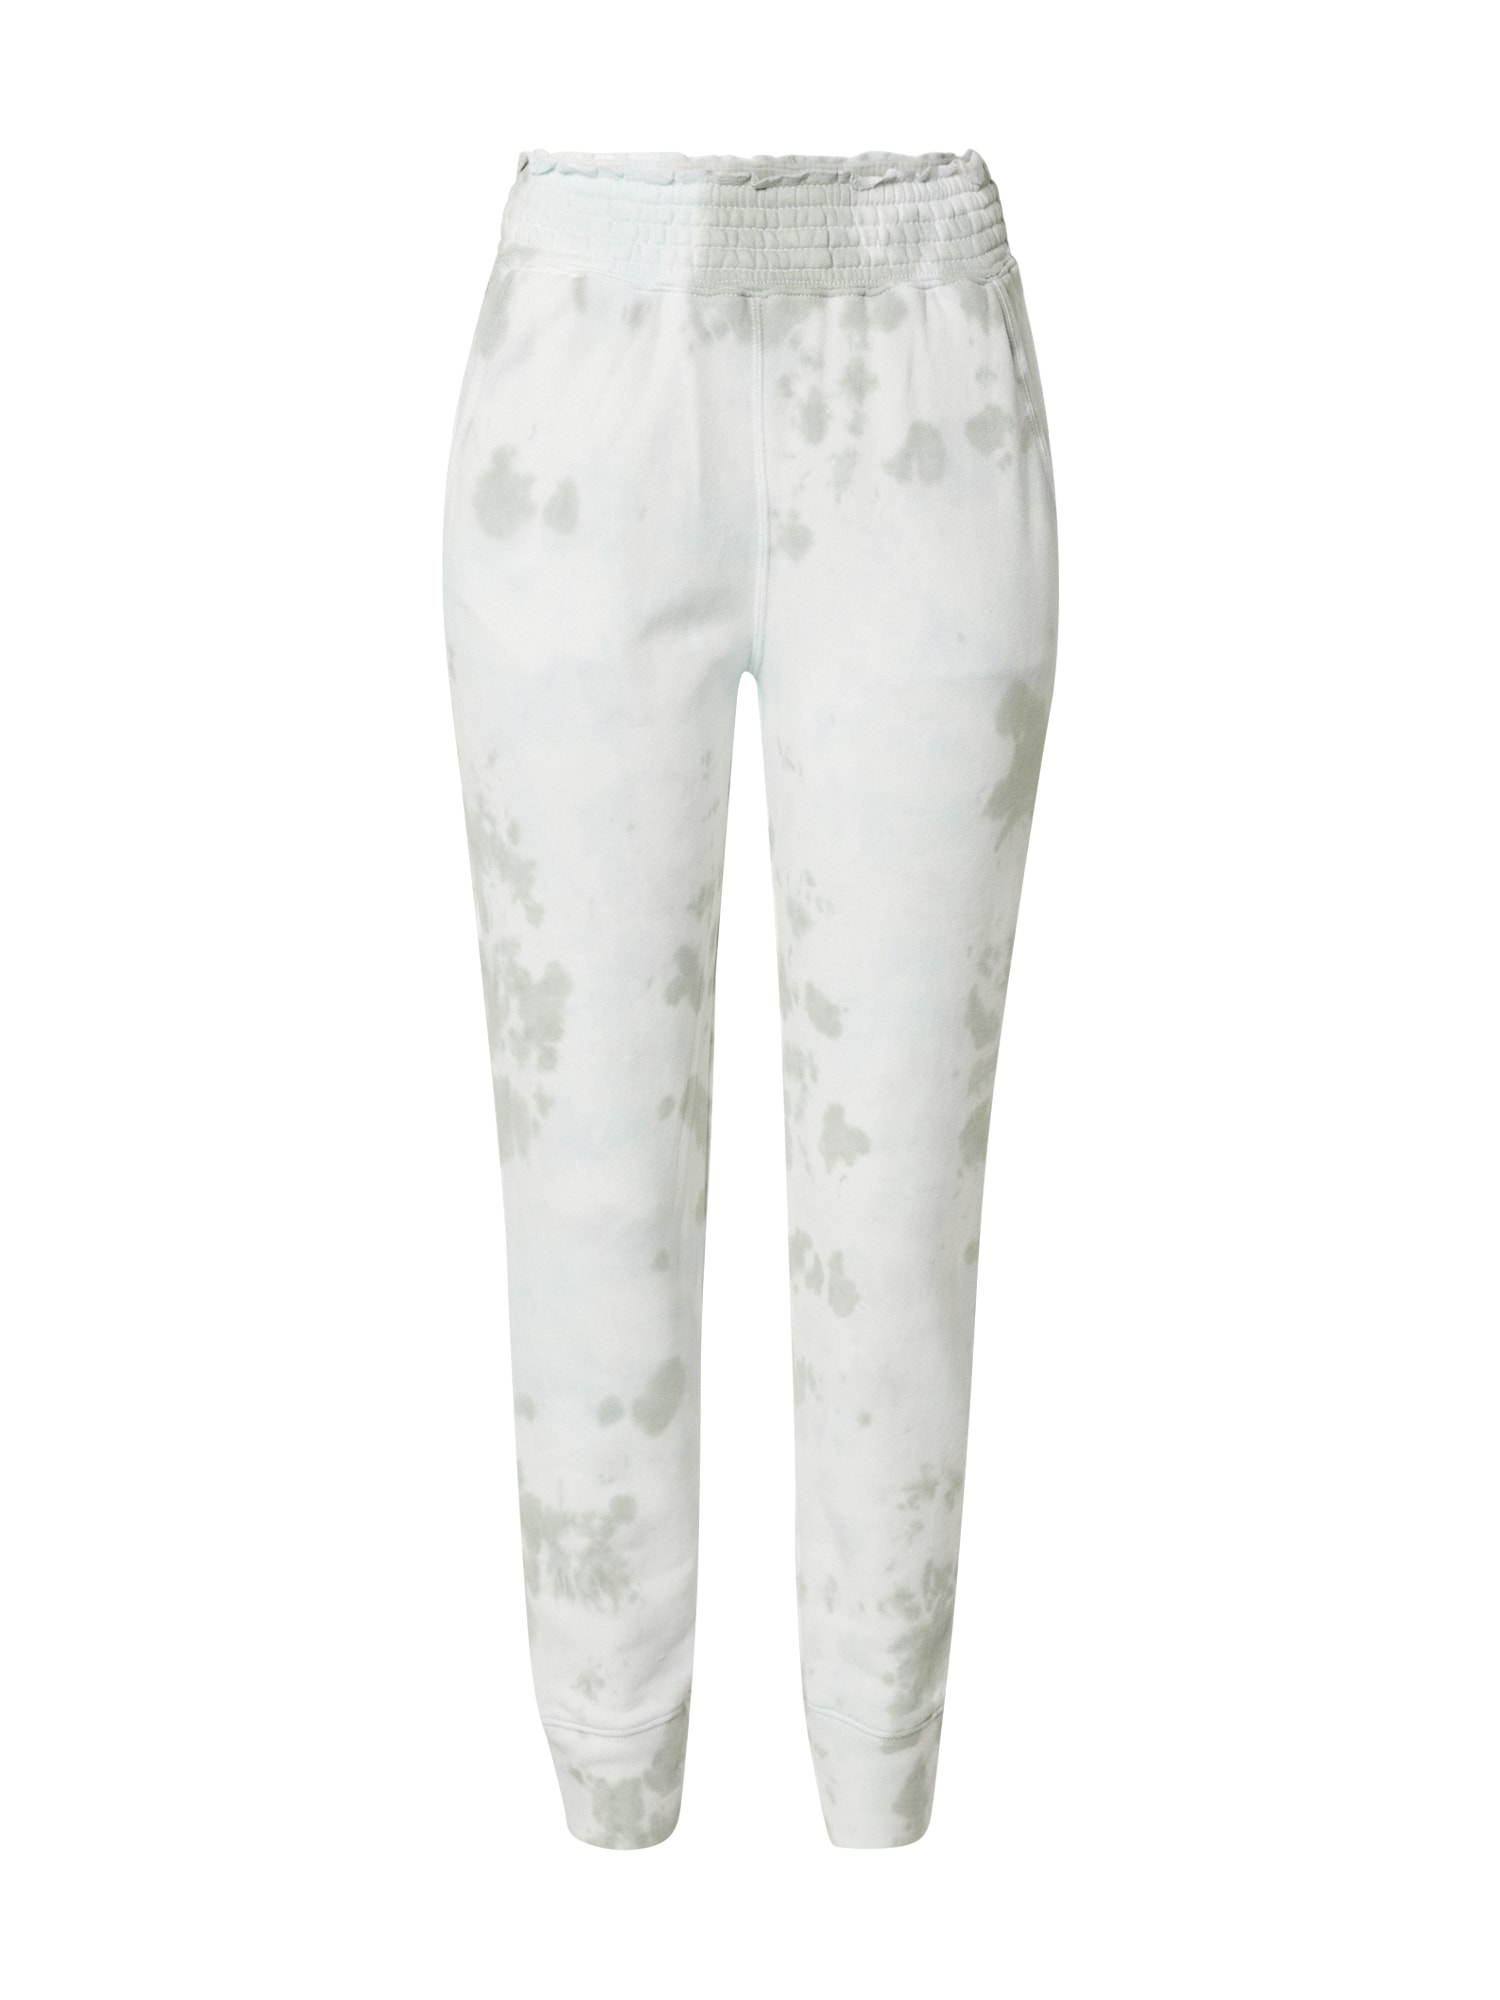 Abercrombie & Fitch Kelnės alyvuogių spalva / natūrali balta